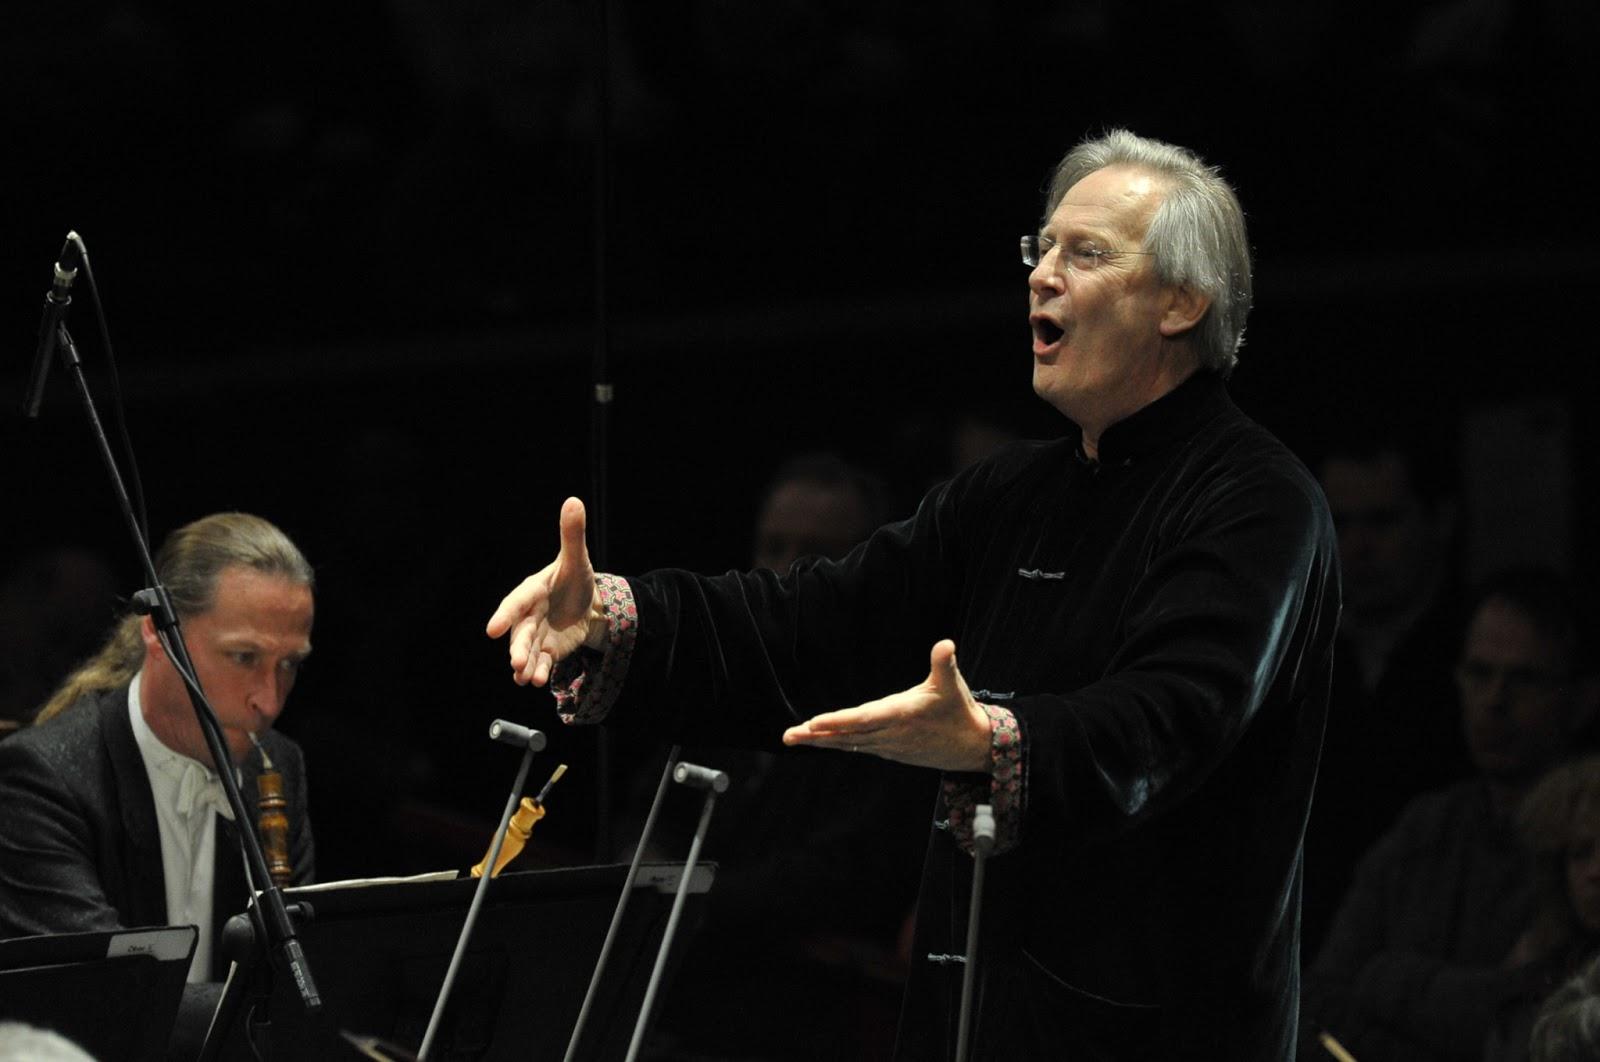 Englischer Dirigent Sir John Eliot Gardiner - Fotorechte:. Chris Christodoulou